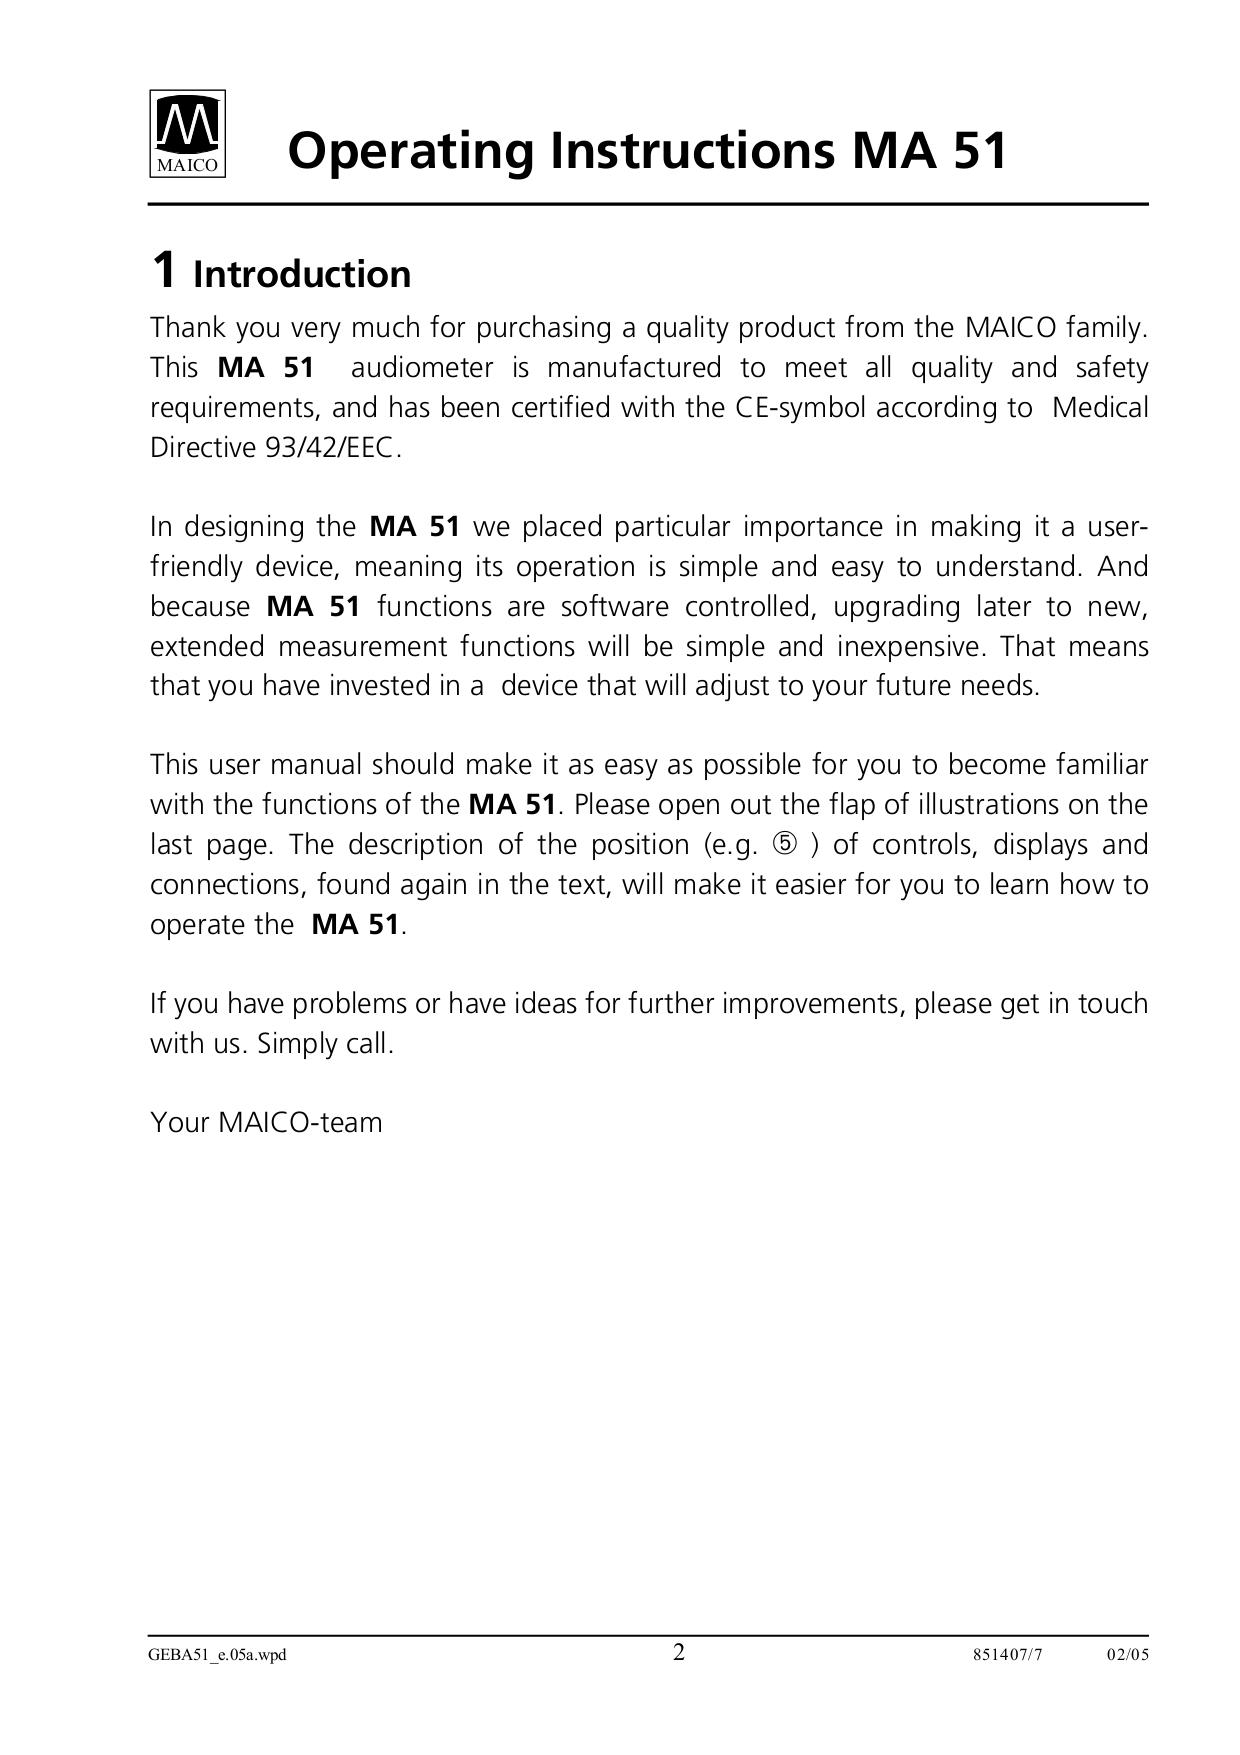 PDF manual for RCA Speaker Ri500